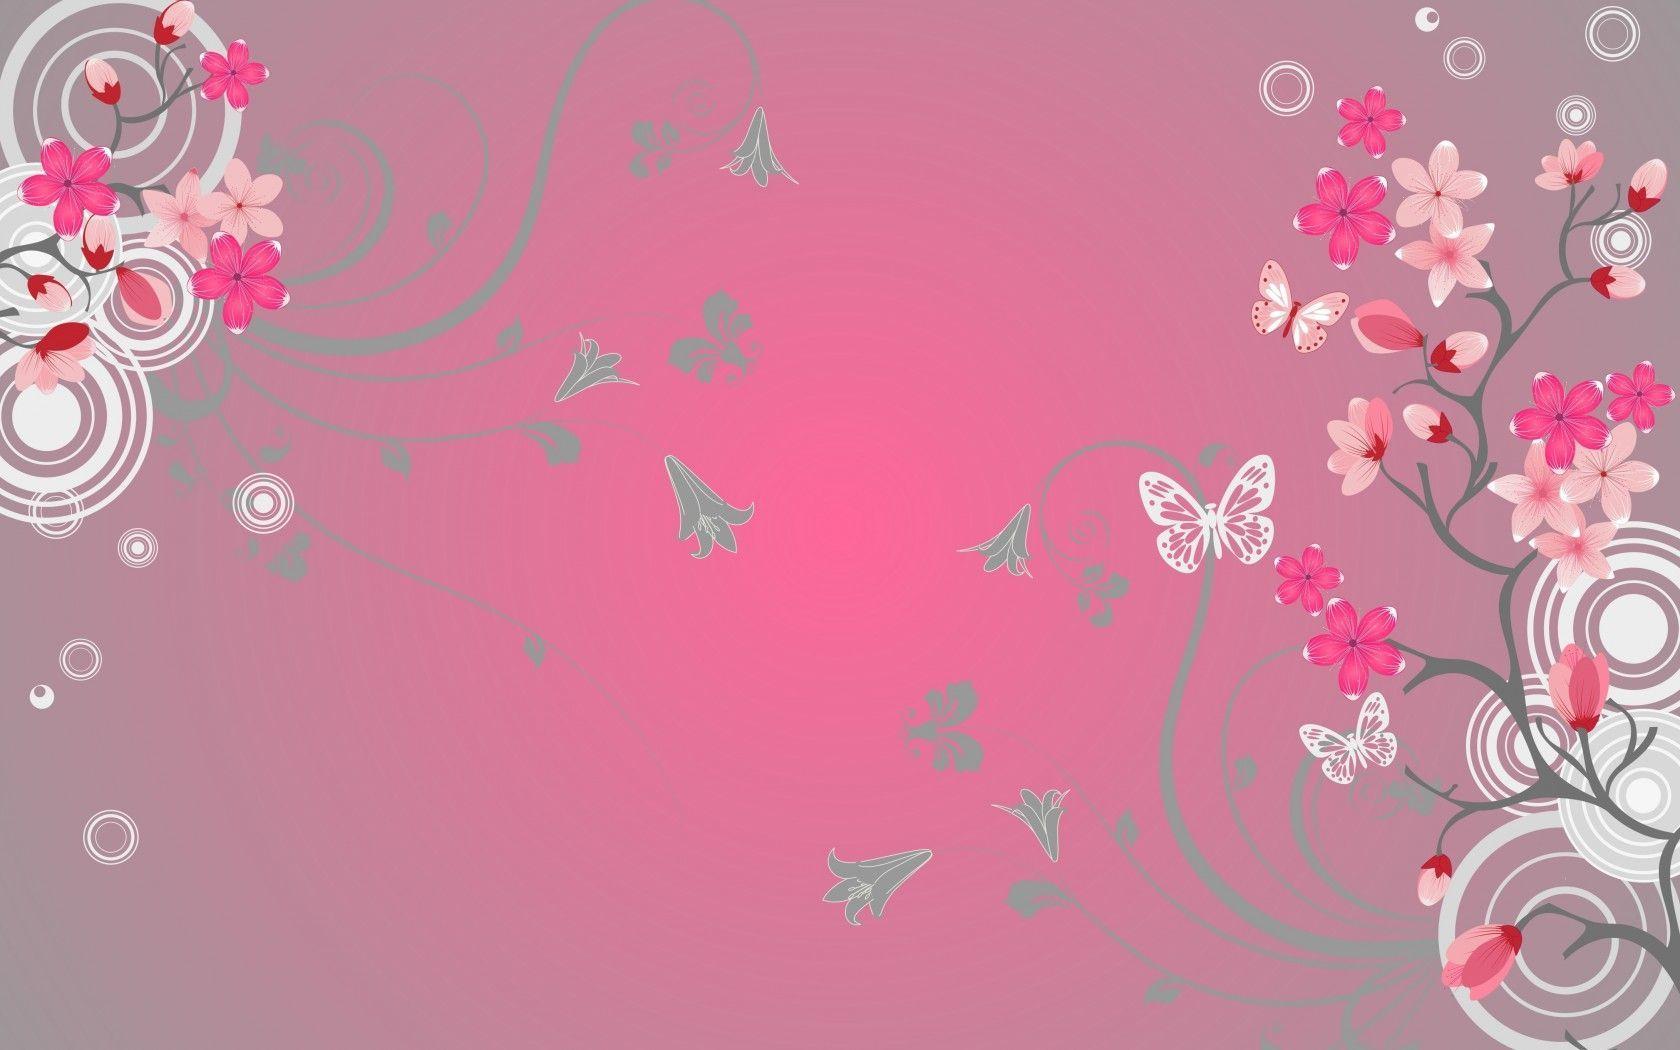 Pink Butterfly Wallpapers Desktop - Wallpaper Cave